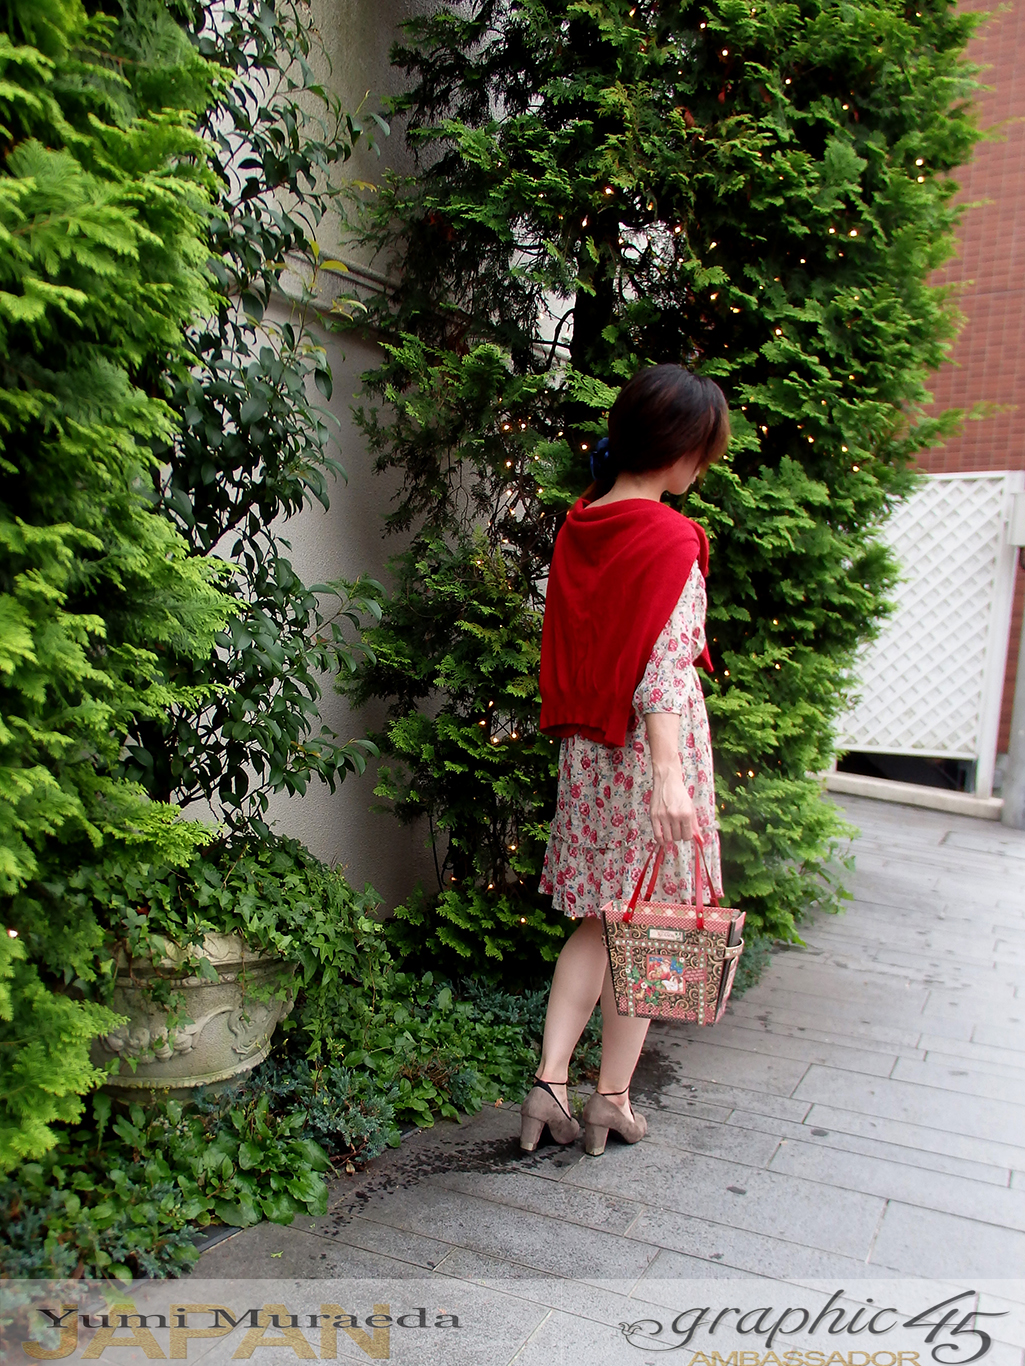 TownToteBagGraphic45StNich0lasbyYumiMuraeadaProductbyGraphic45Photo8.jpg